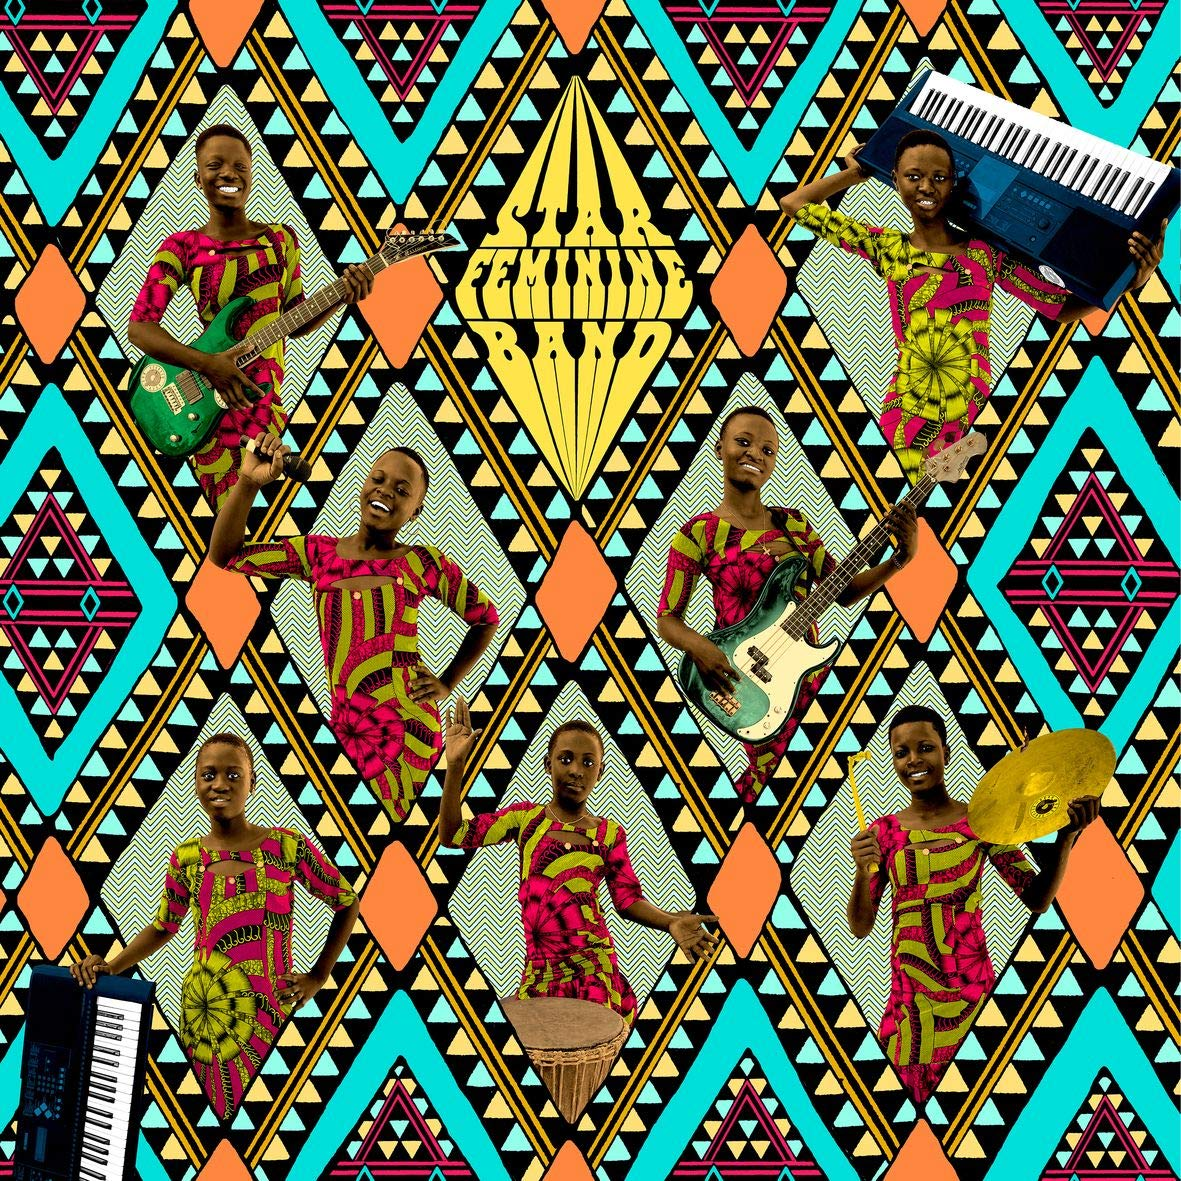 Star Feminine Band - Star Feminine Band (2020) [FLAC] Download